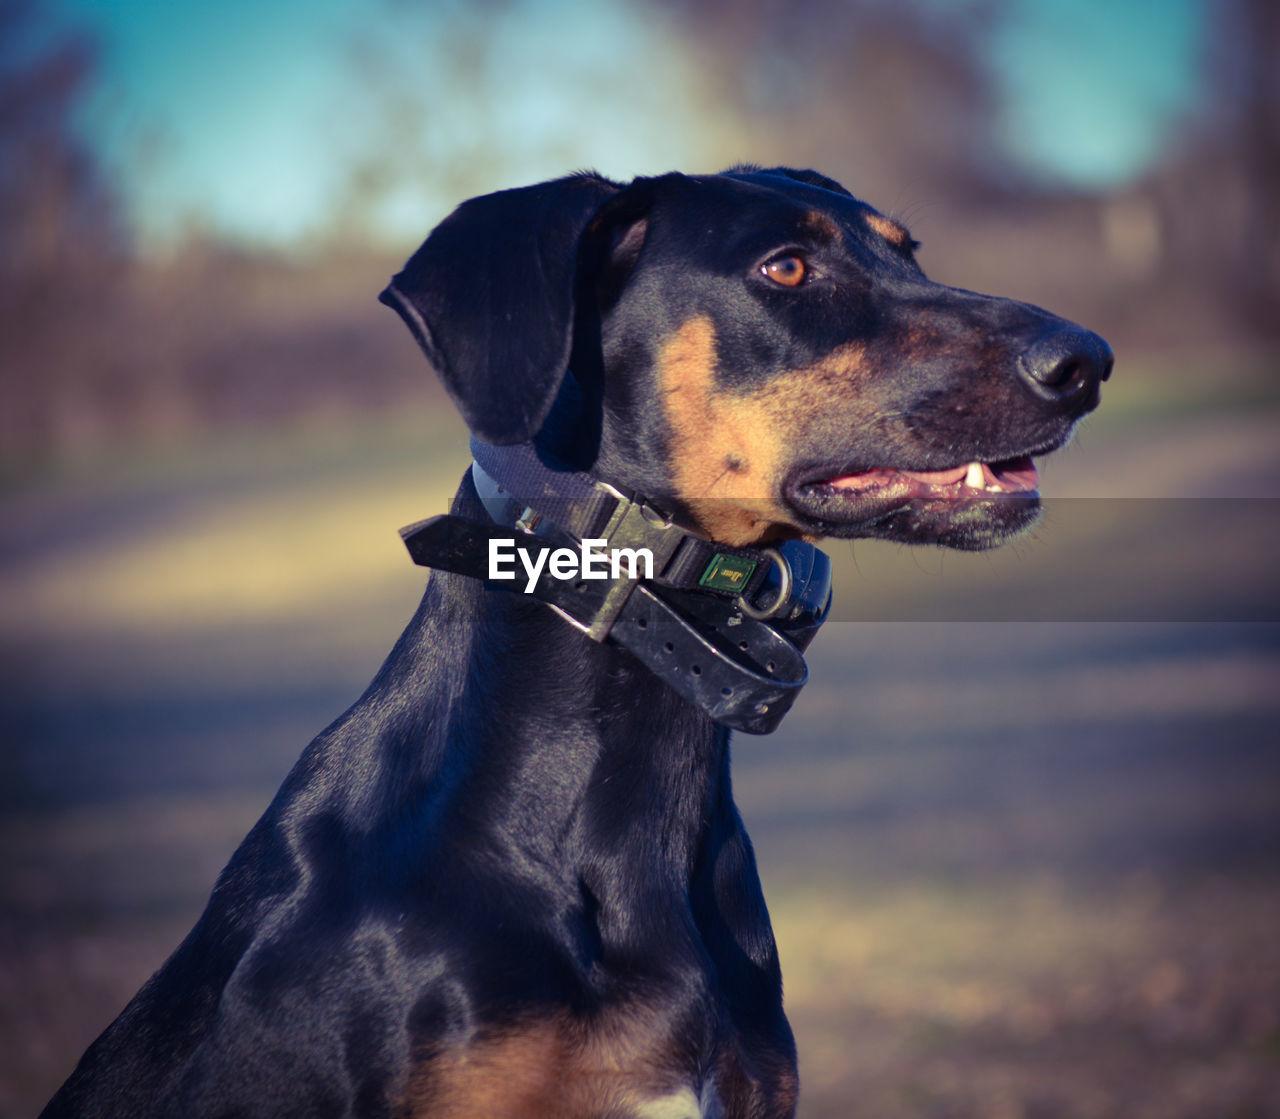 CLOSE-UP OF DOG ON CAMERA